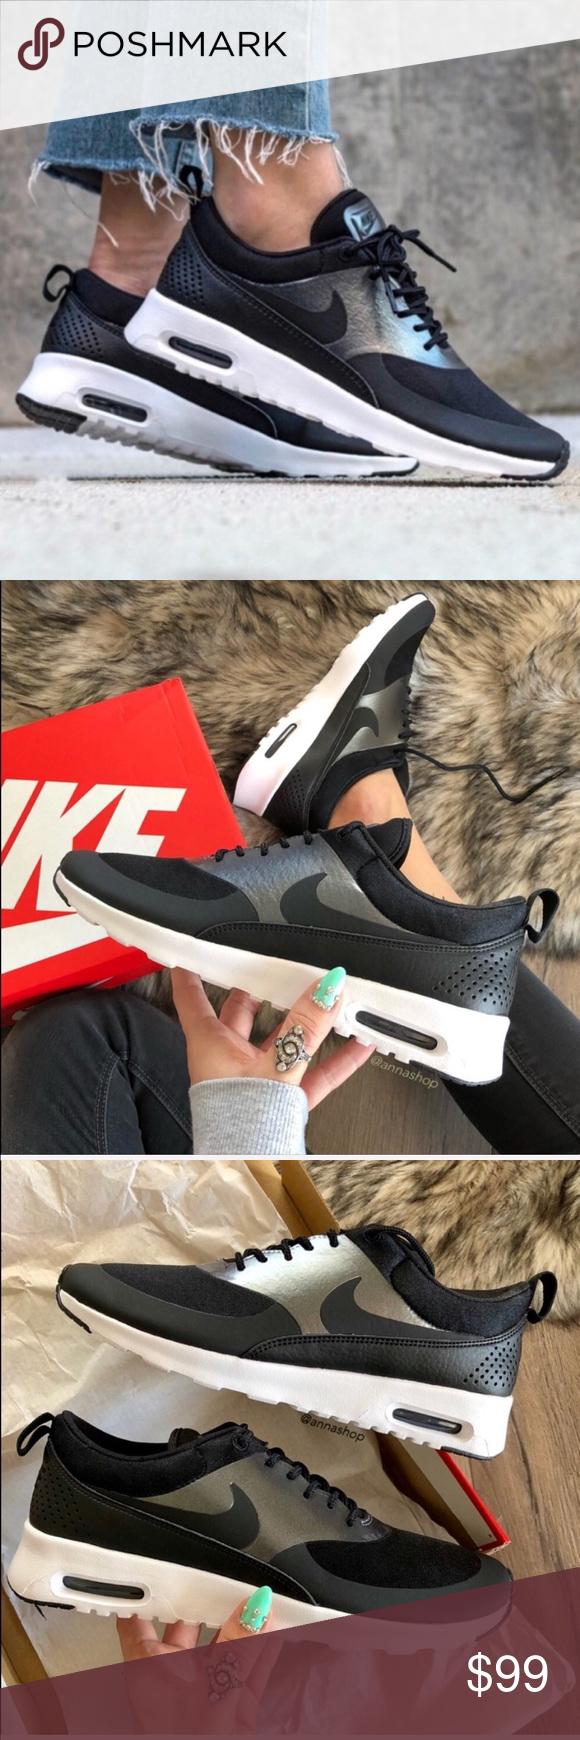 Rare Air Max Thea Shoe Nike White Black Women's